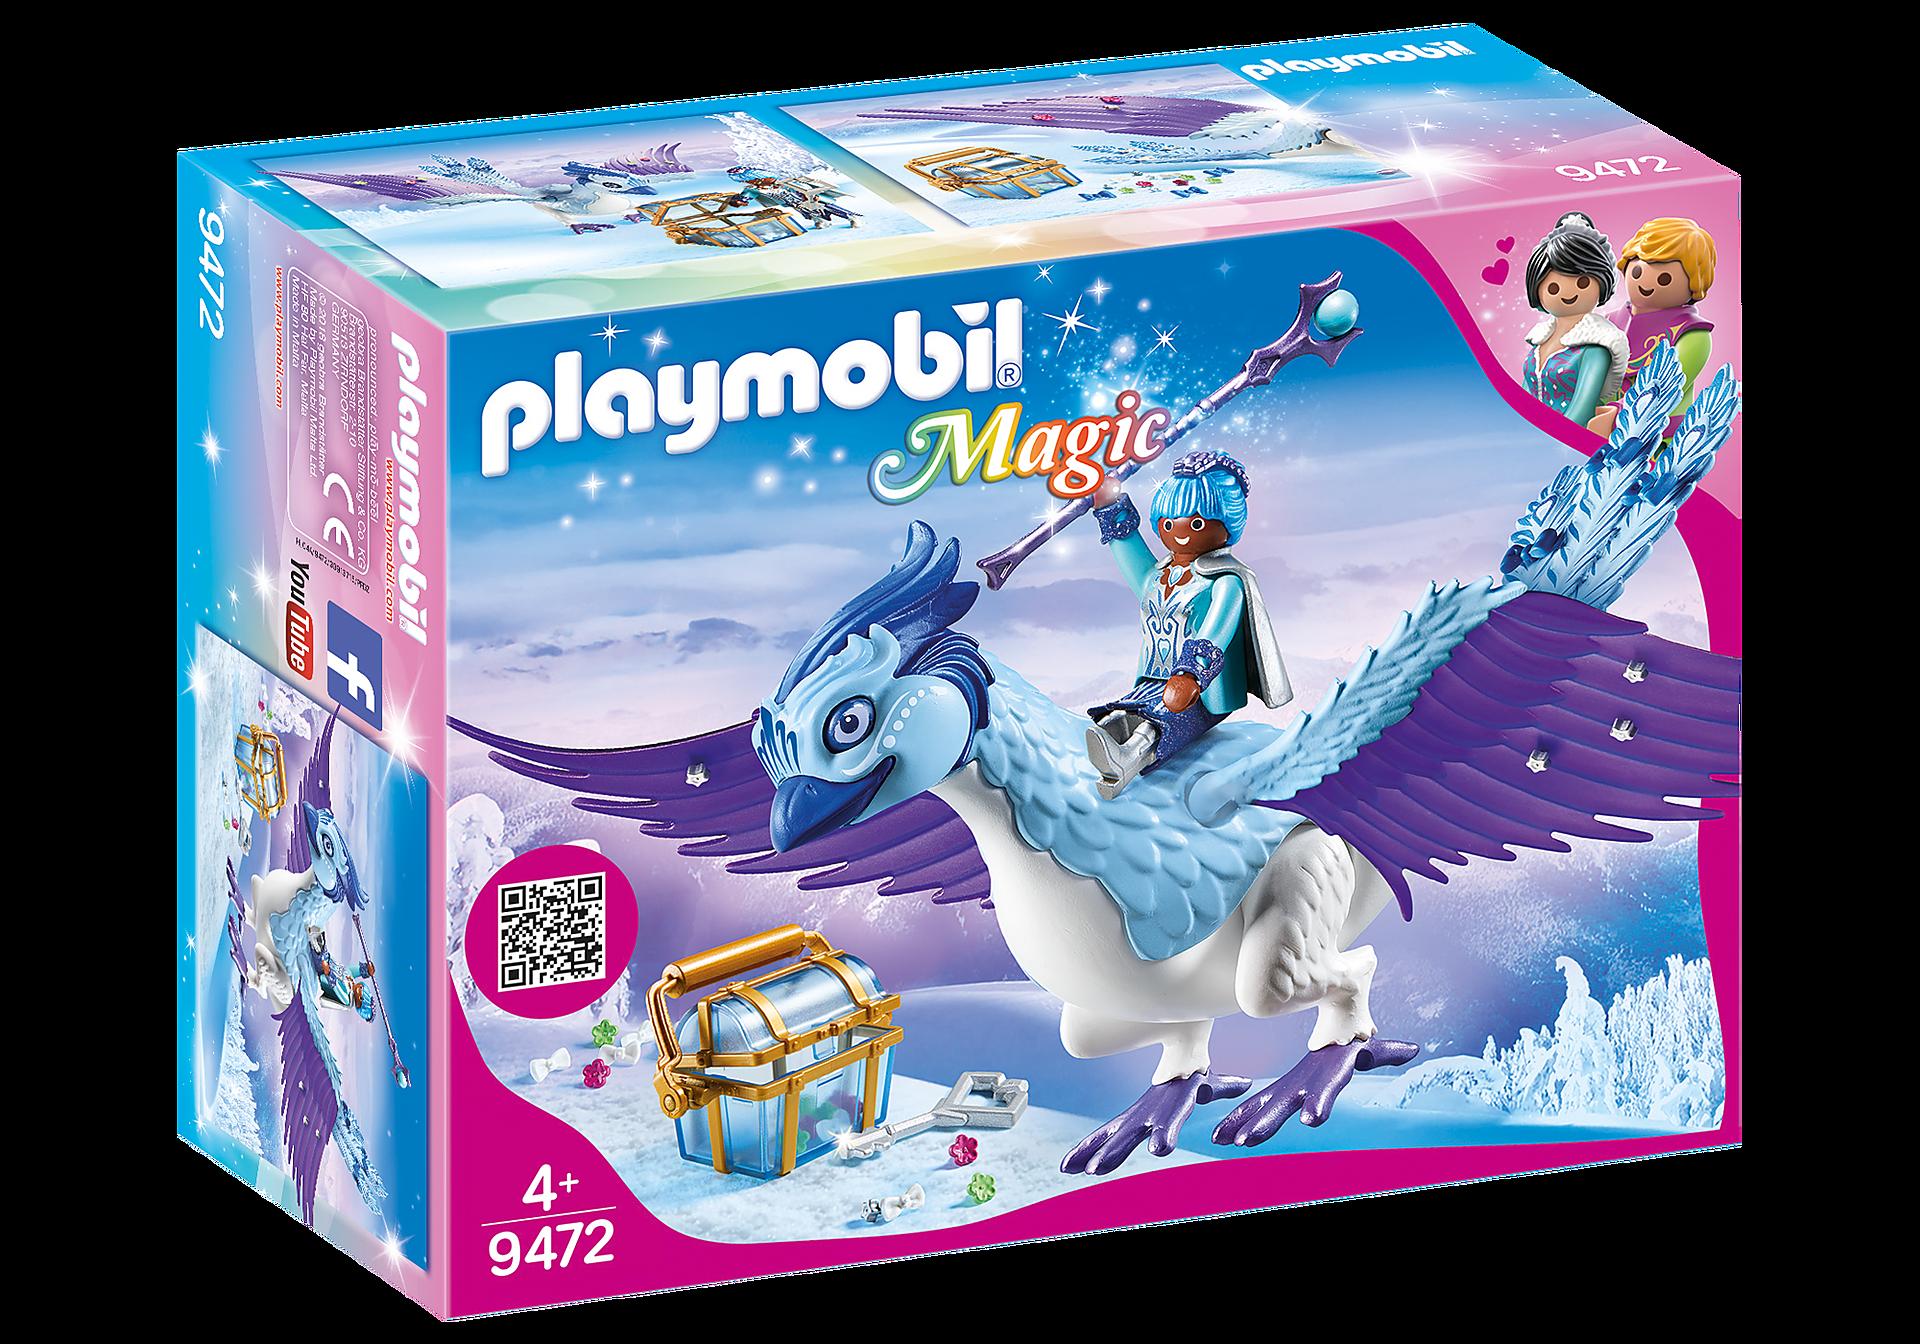 http://media.playmobil.com/i/playmobil/9472_product_box_front/Gardienne et Phénix royal